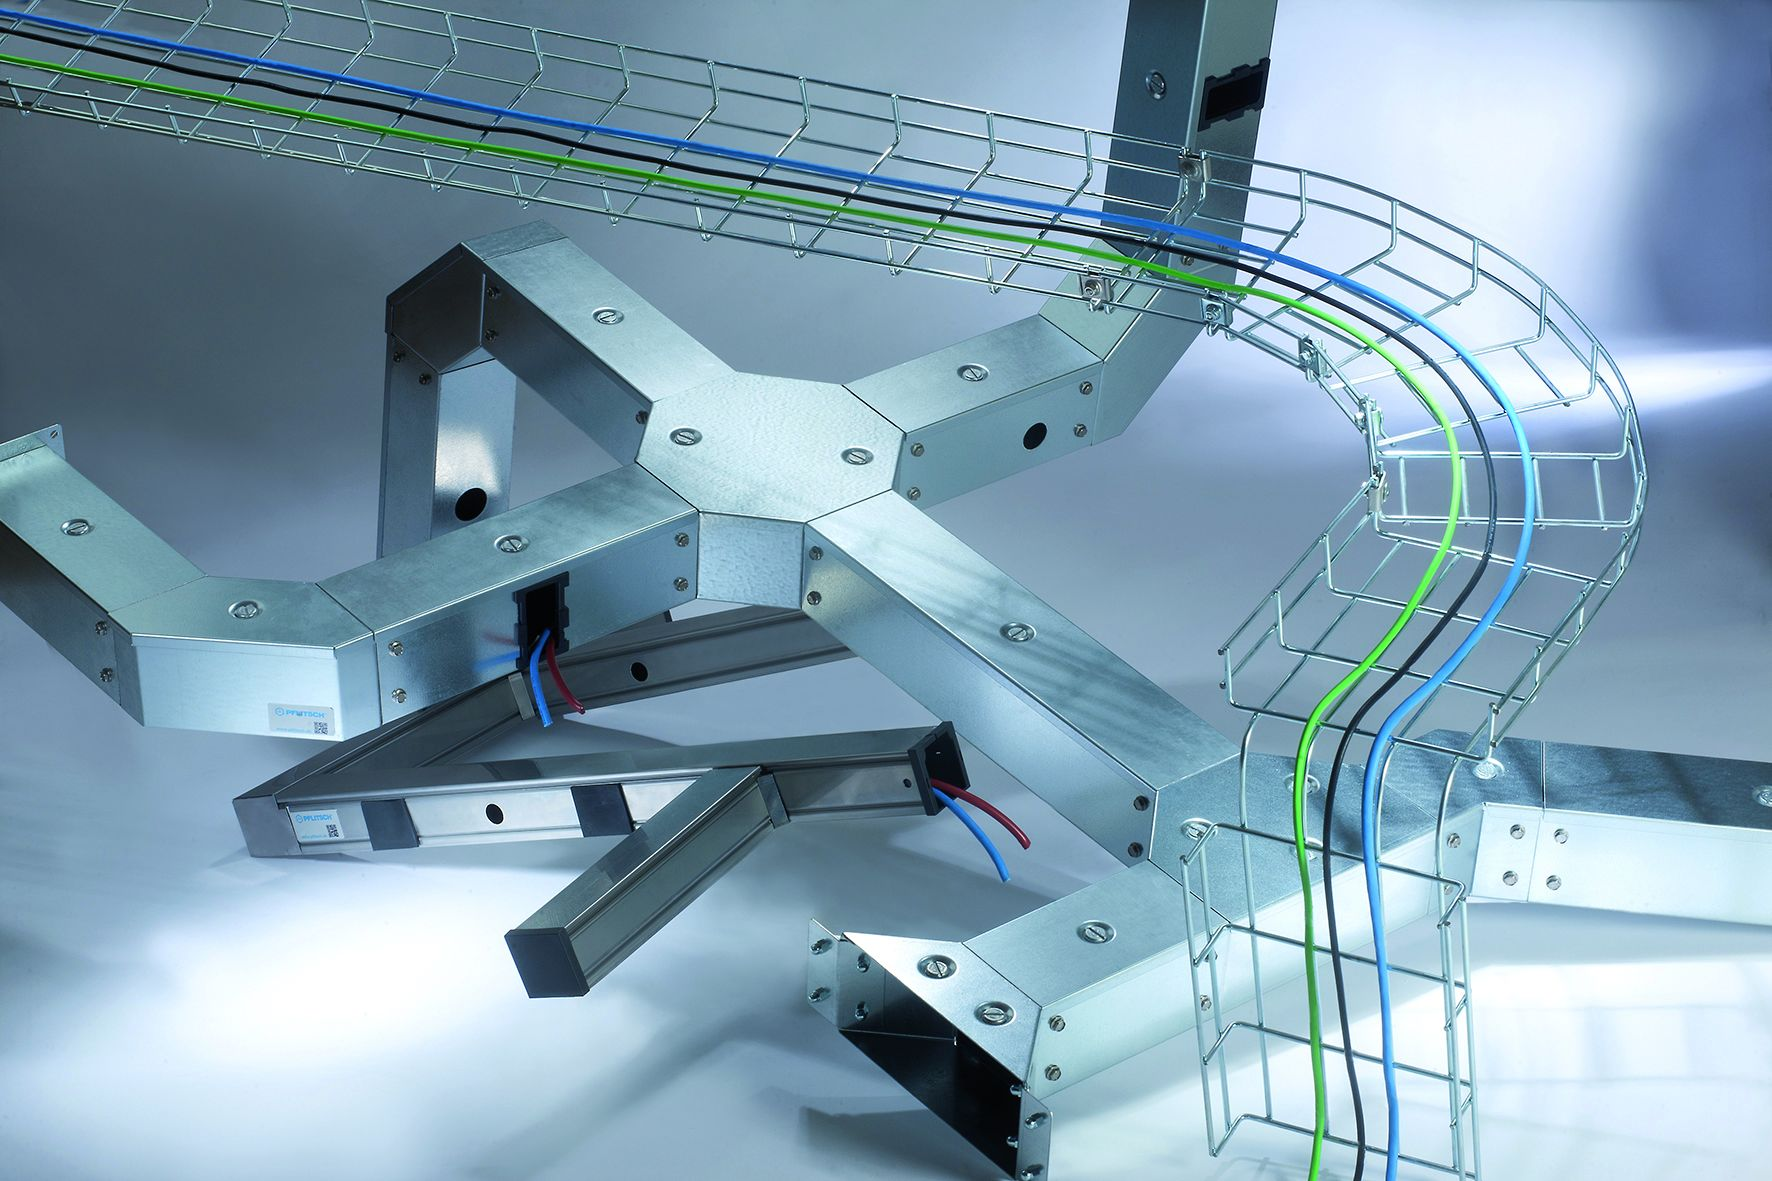 Kabelkanäle nach Industrie 4.0 realisieren